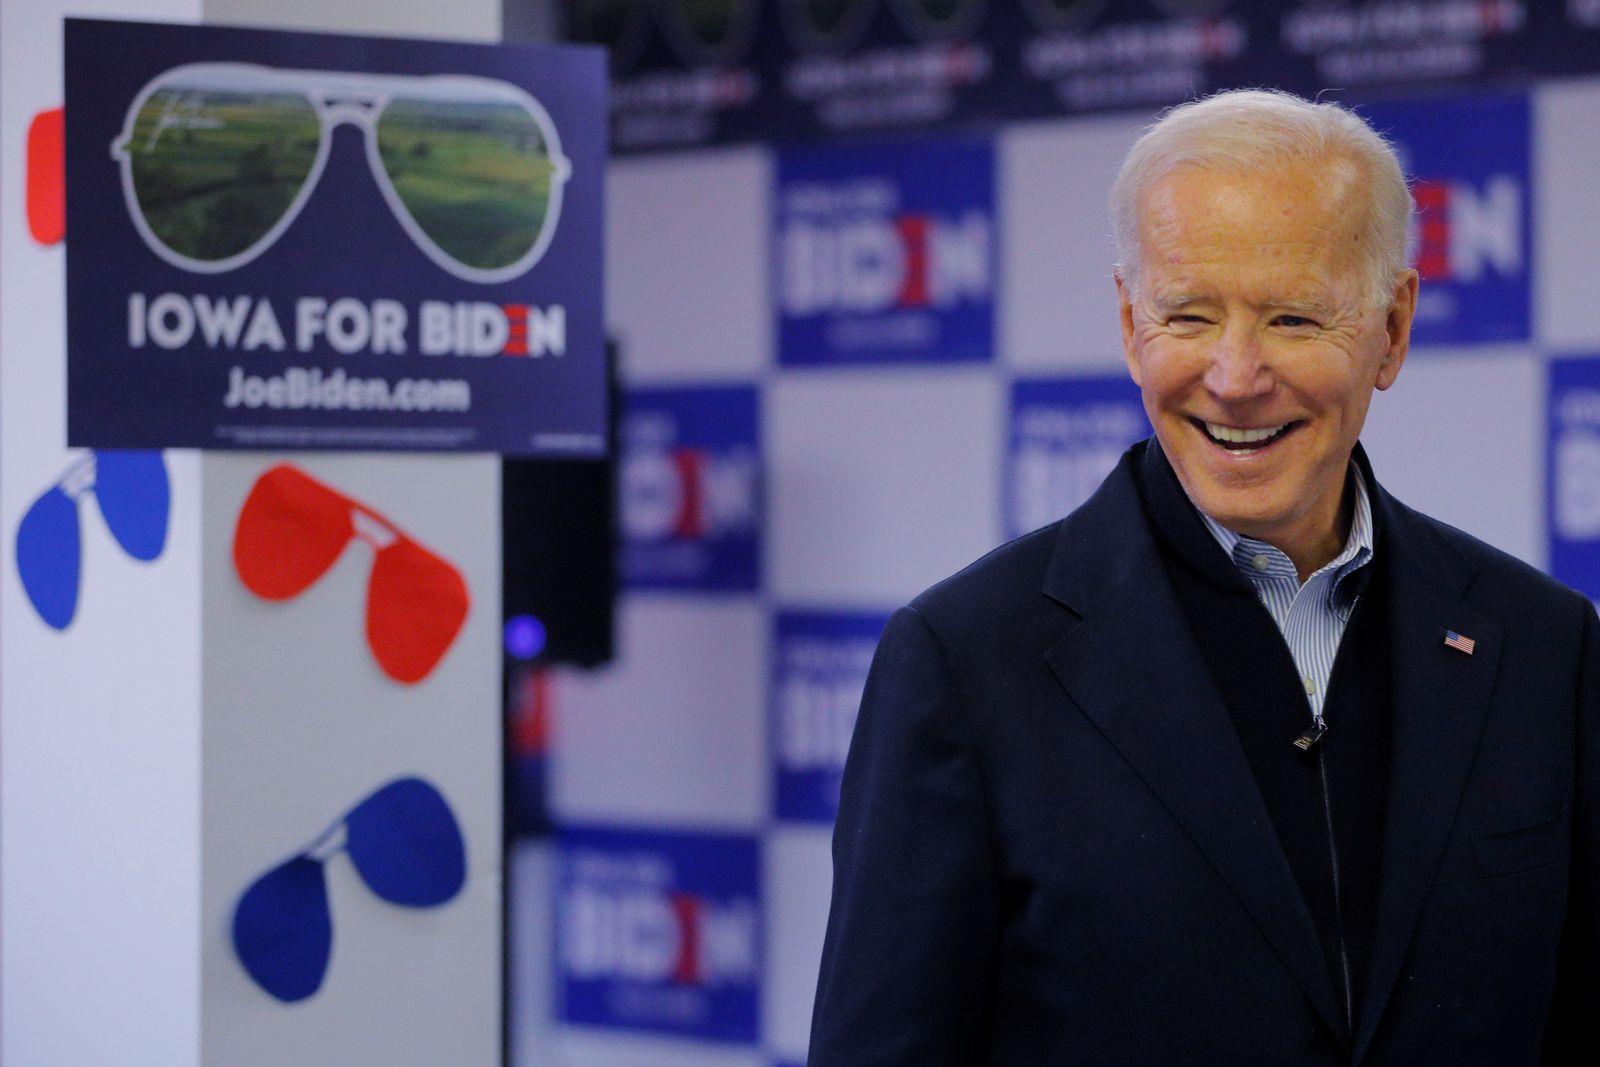 Democratic 2020 U.S. presidential candidate Biden visits volunteers phone-banking in Des Moines